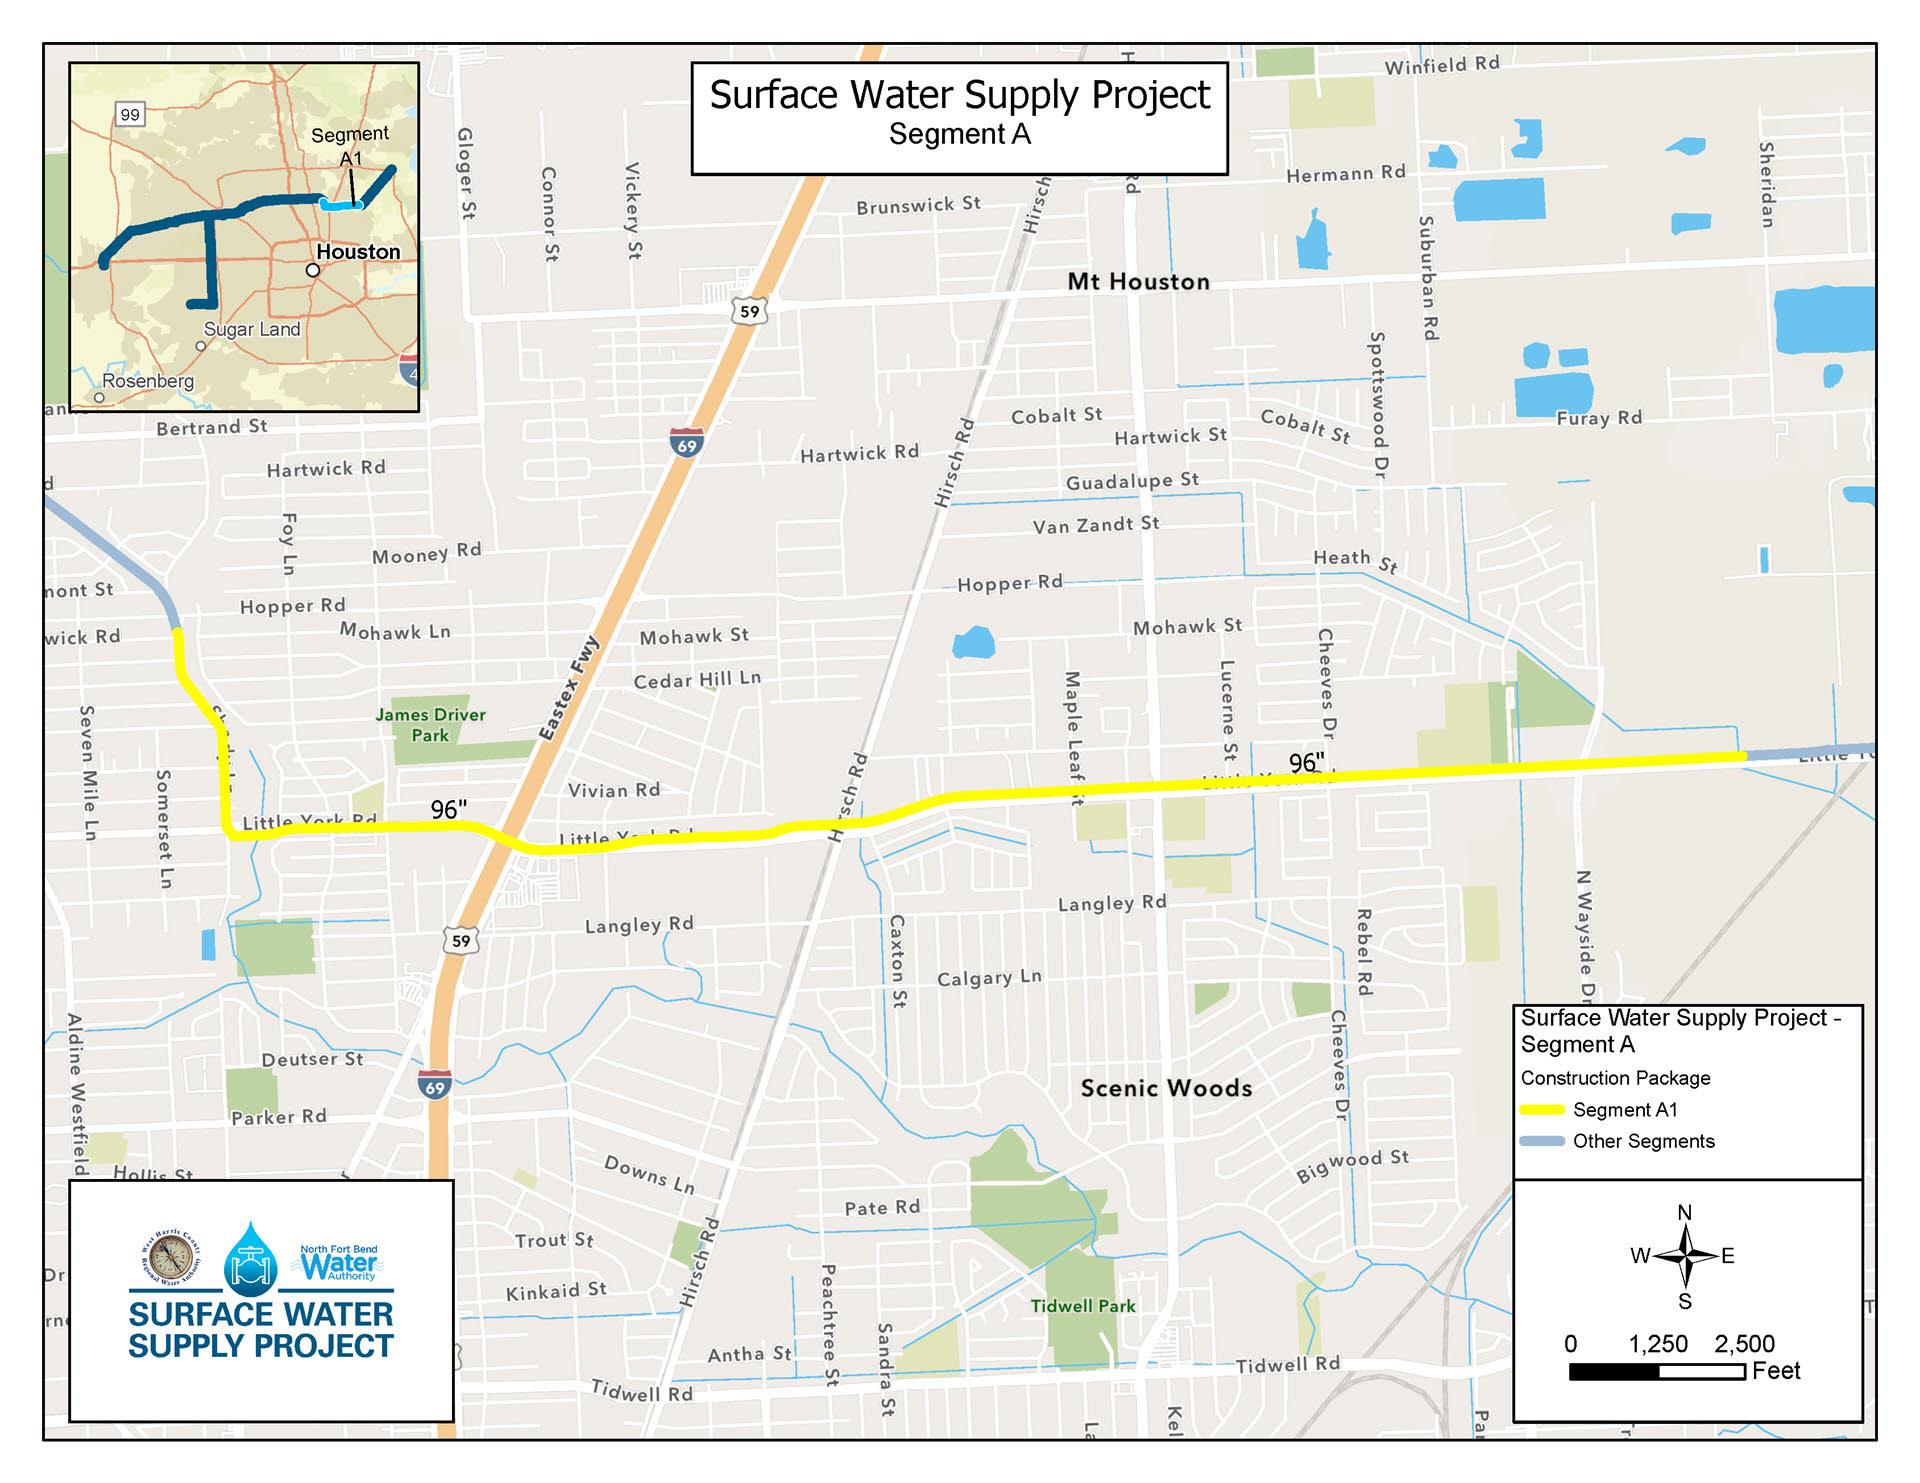 SWSP - Segment A1